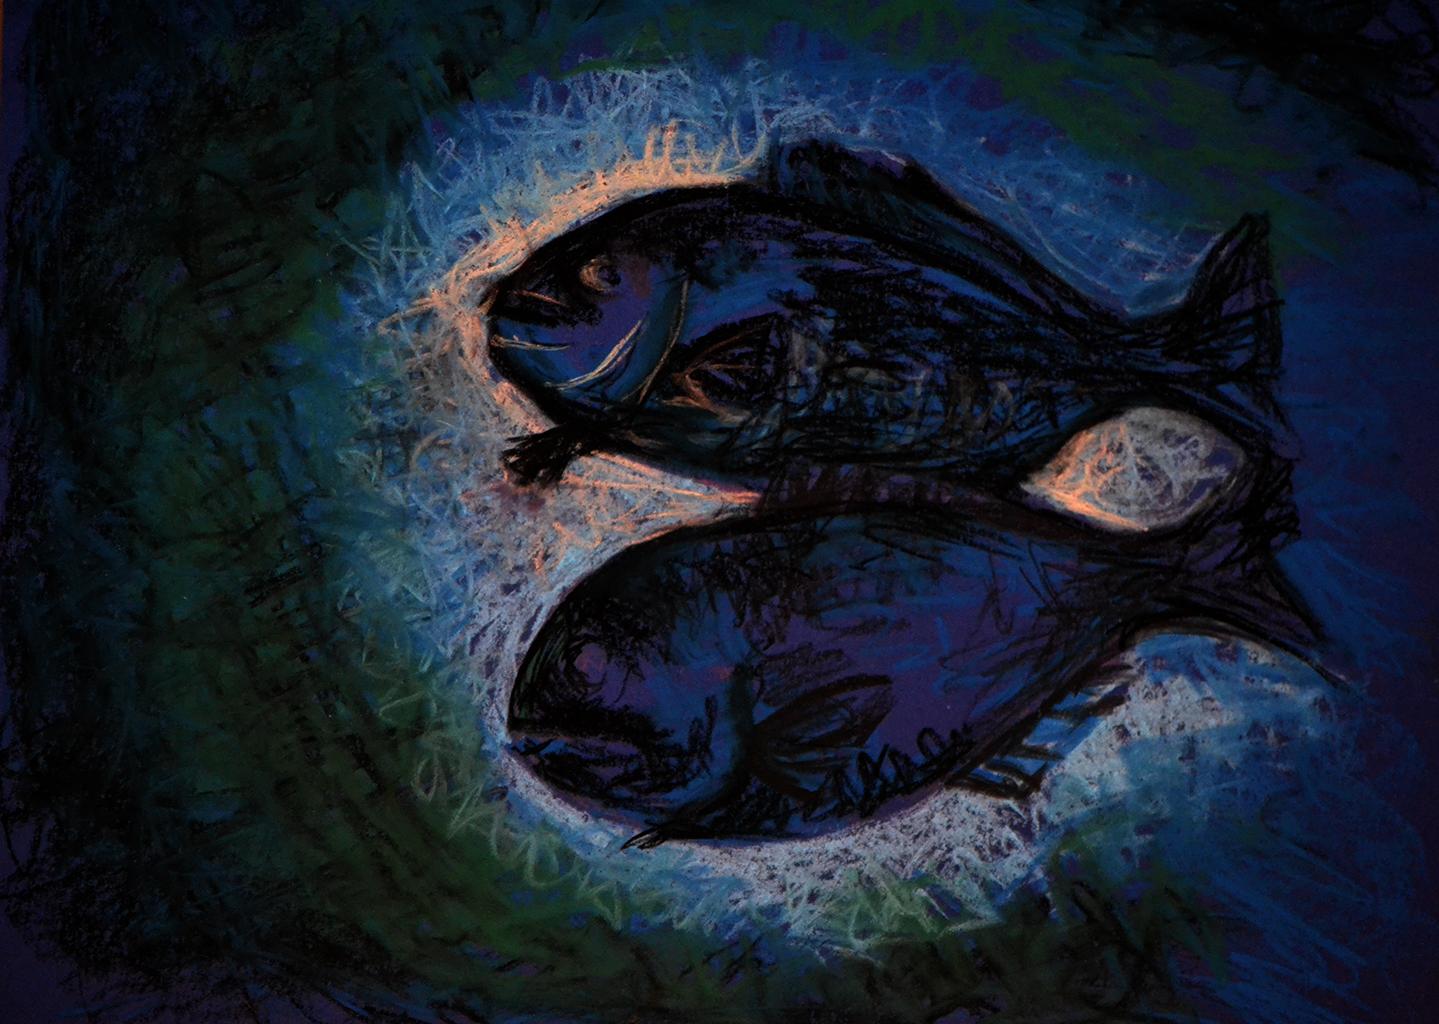 Rockfish from beneath